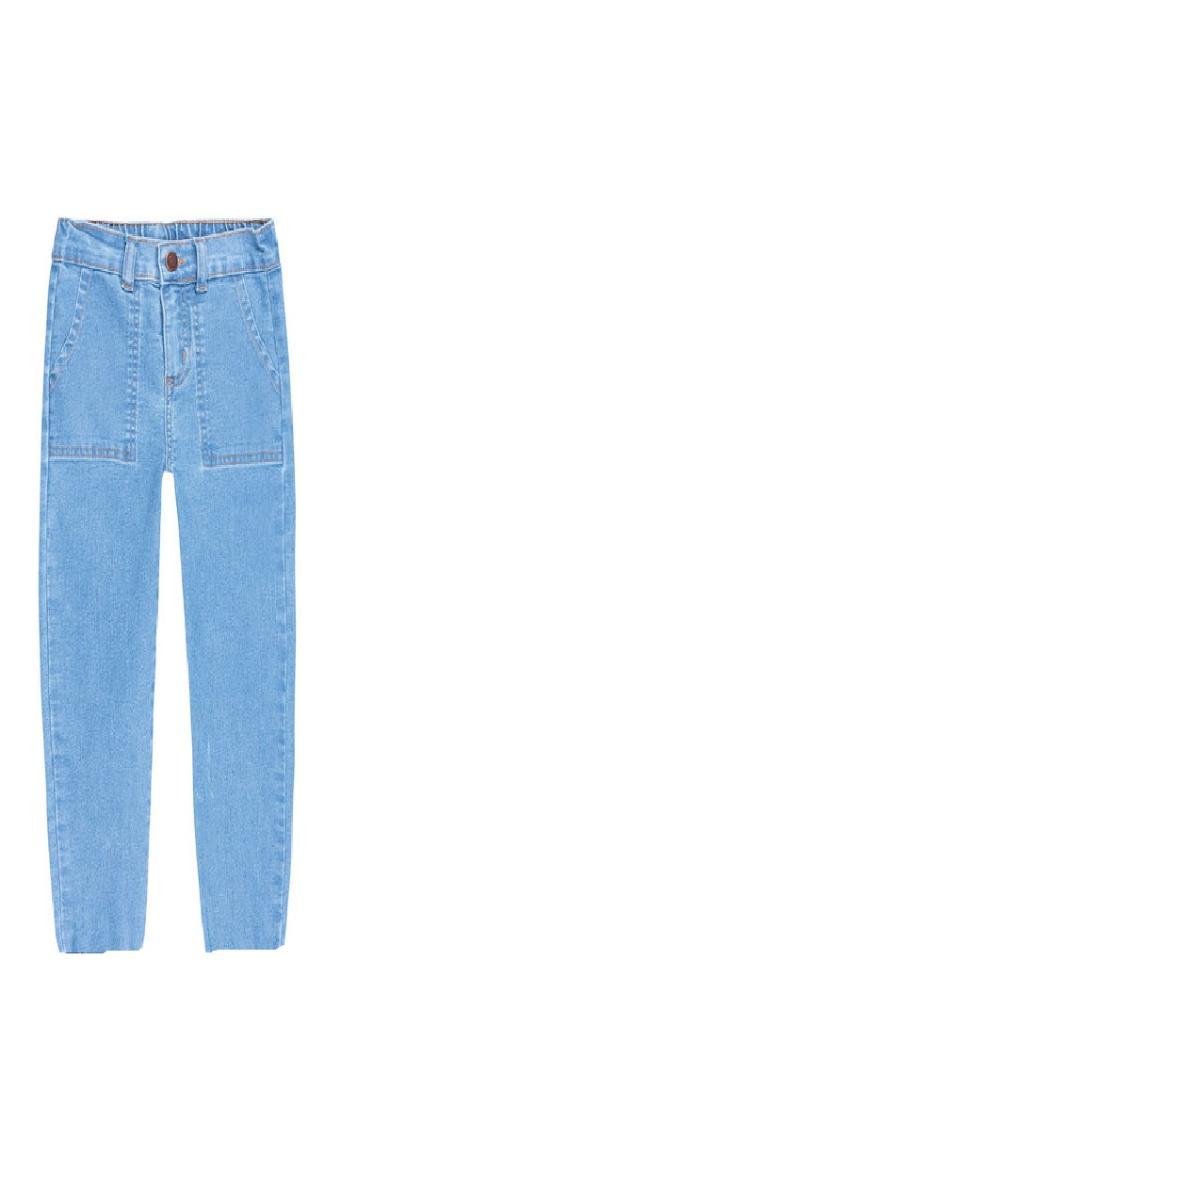 Calça Fem Infantil Puc Ubln 1asn Jeans Claro